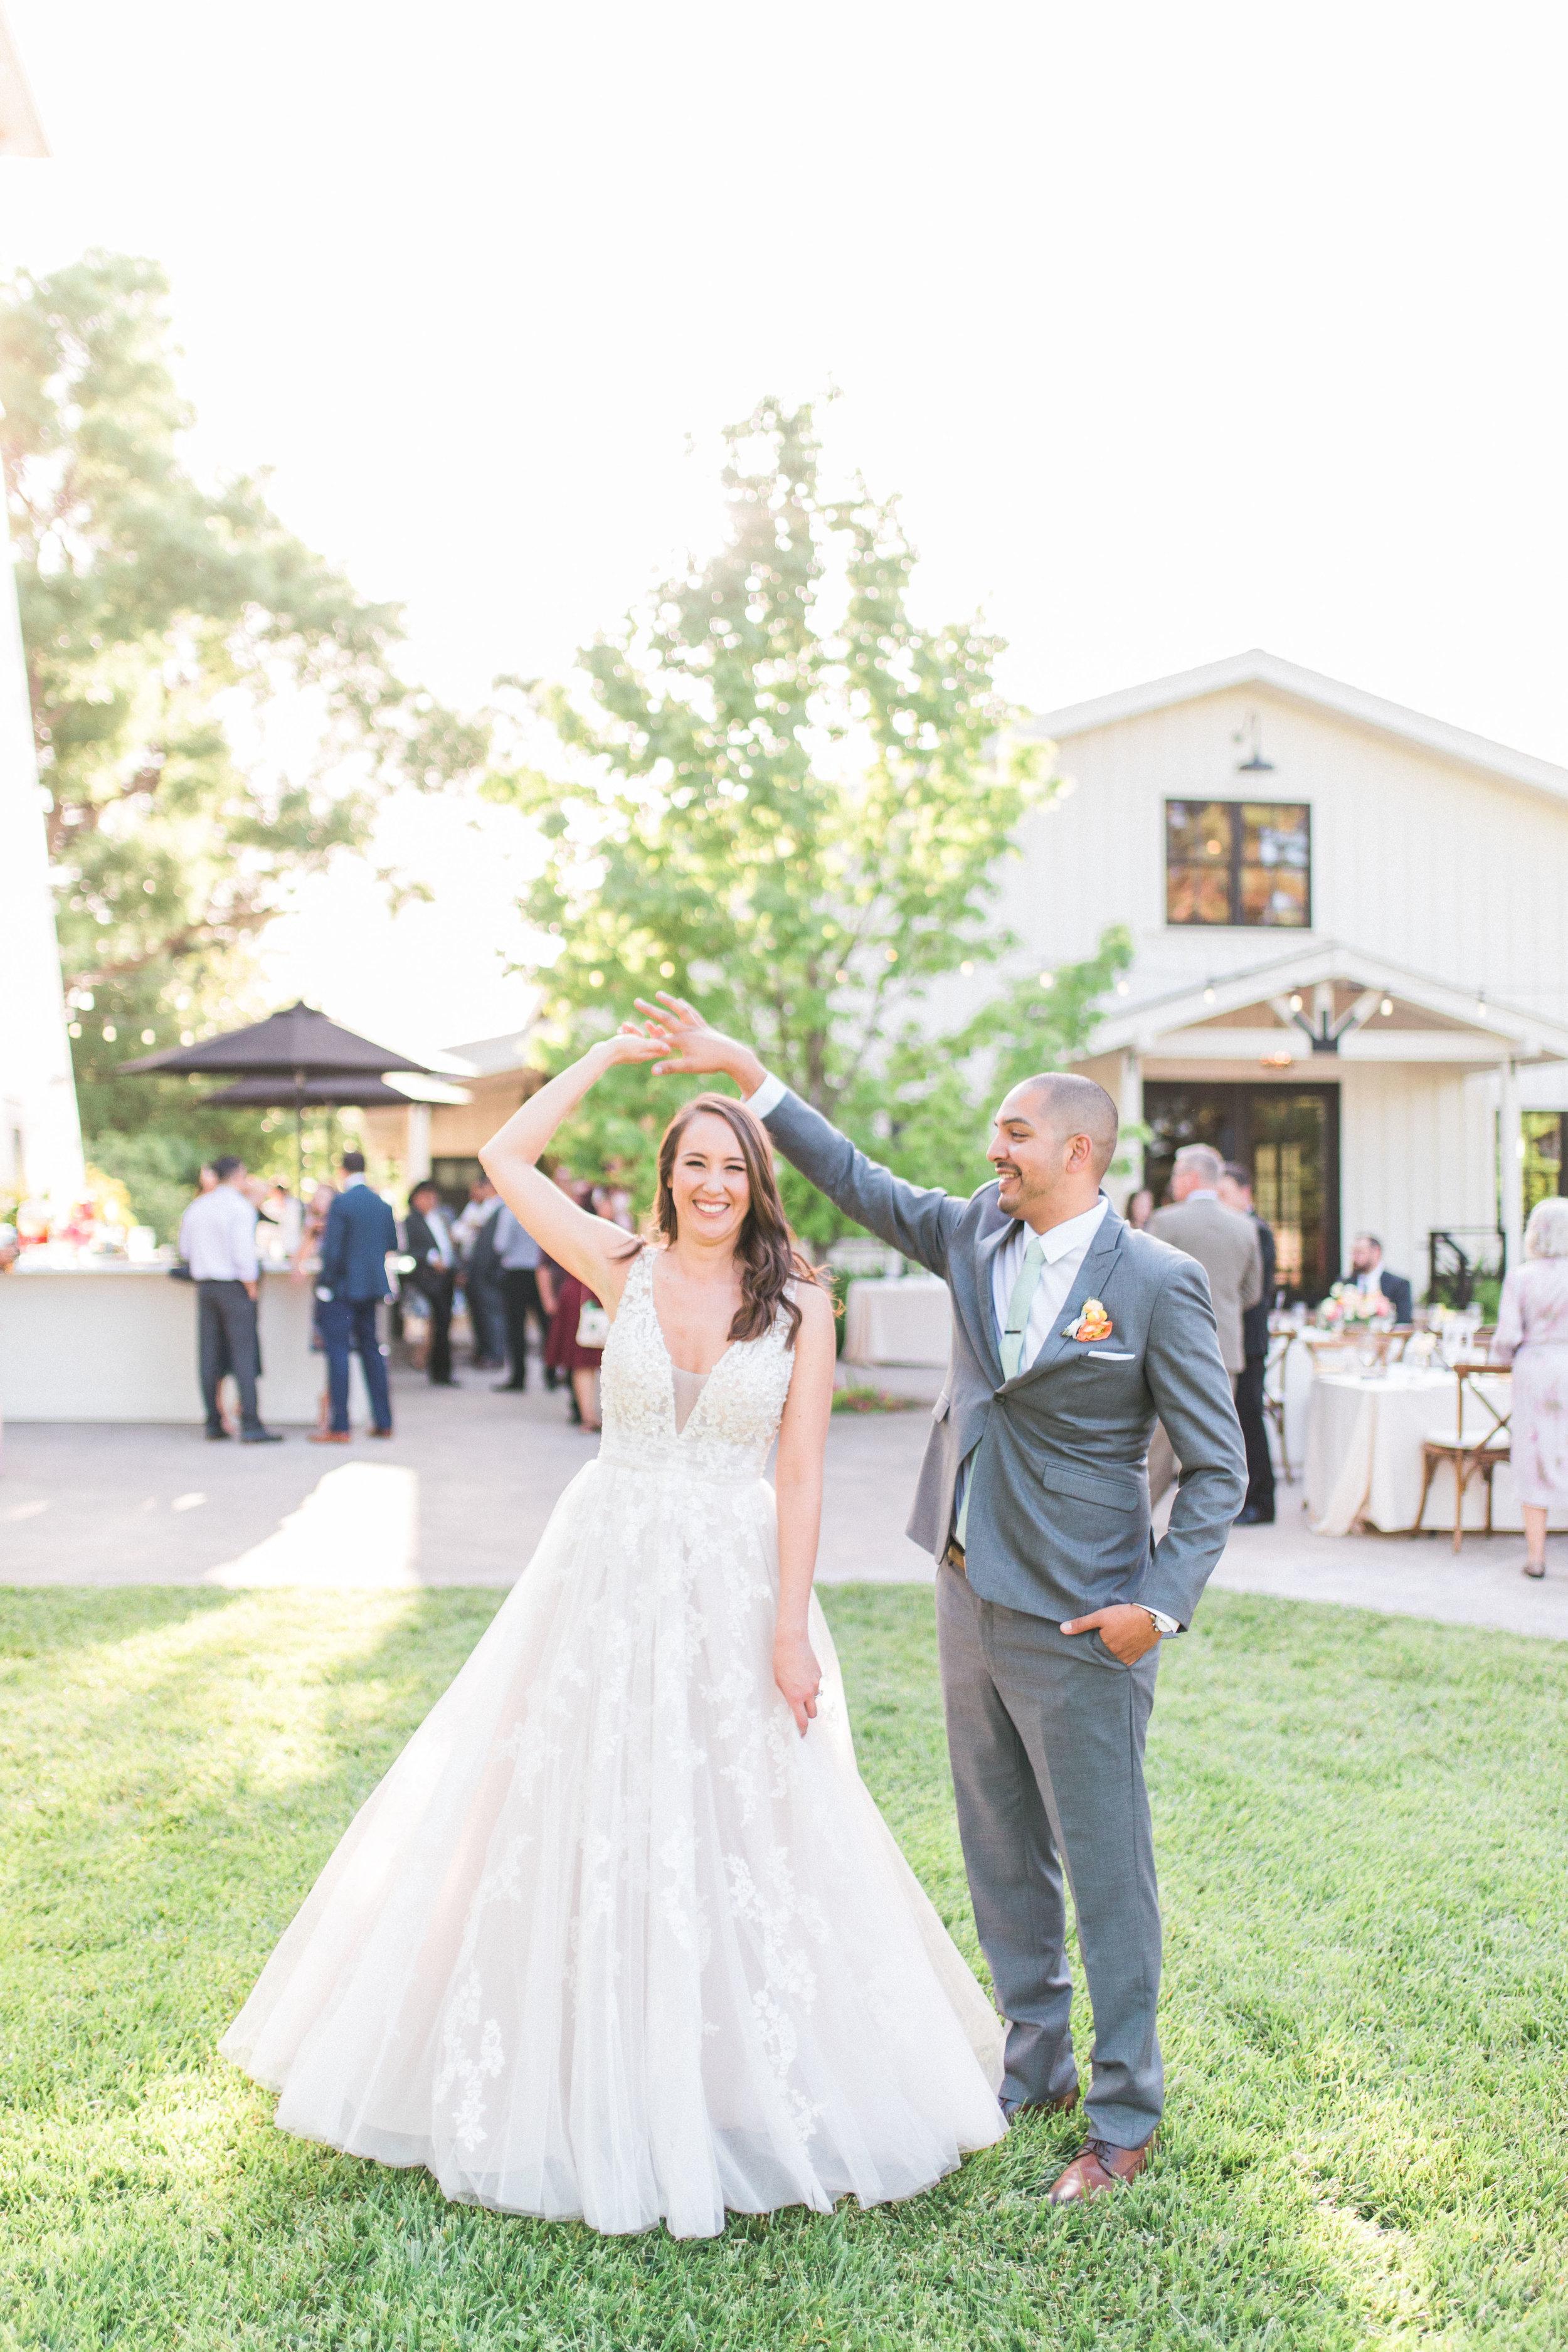 Tess-Jesse-Wedding-SP-by-JBJ-Pictures-17.jpg